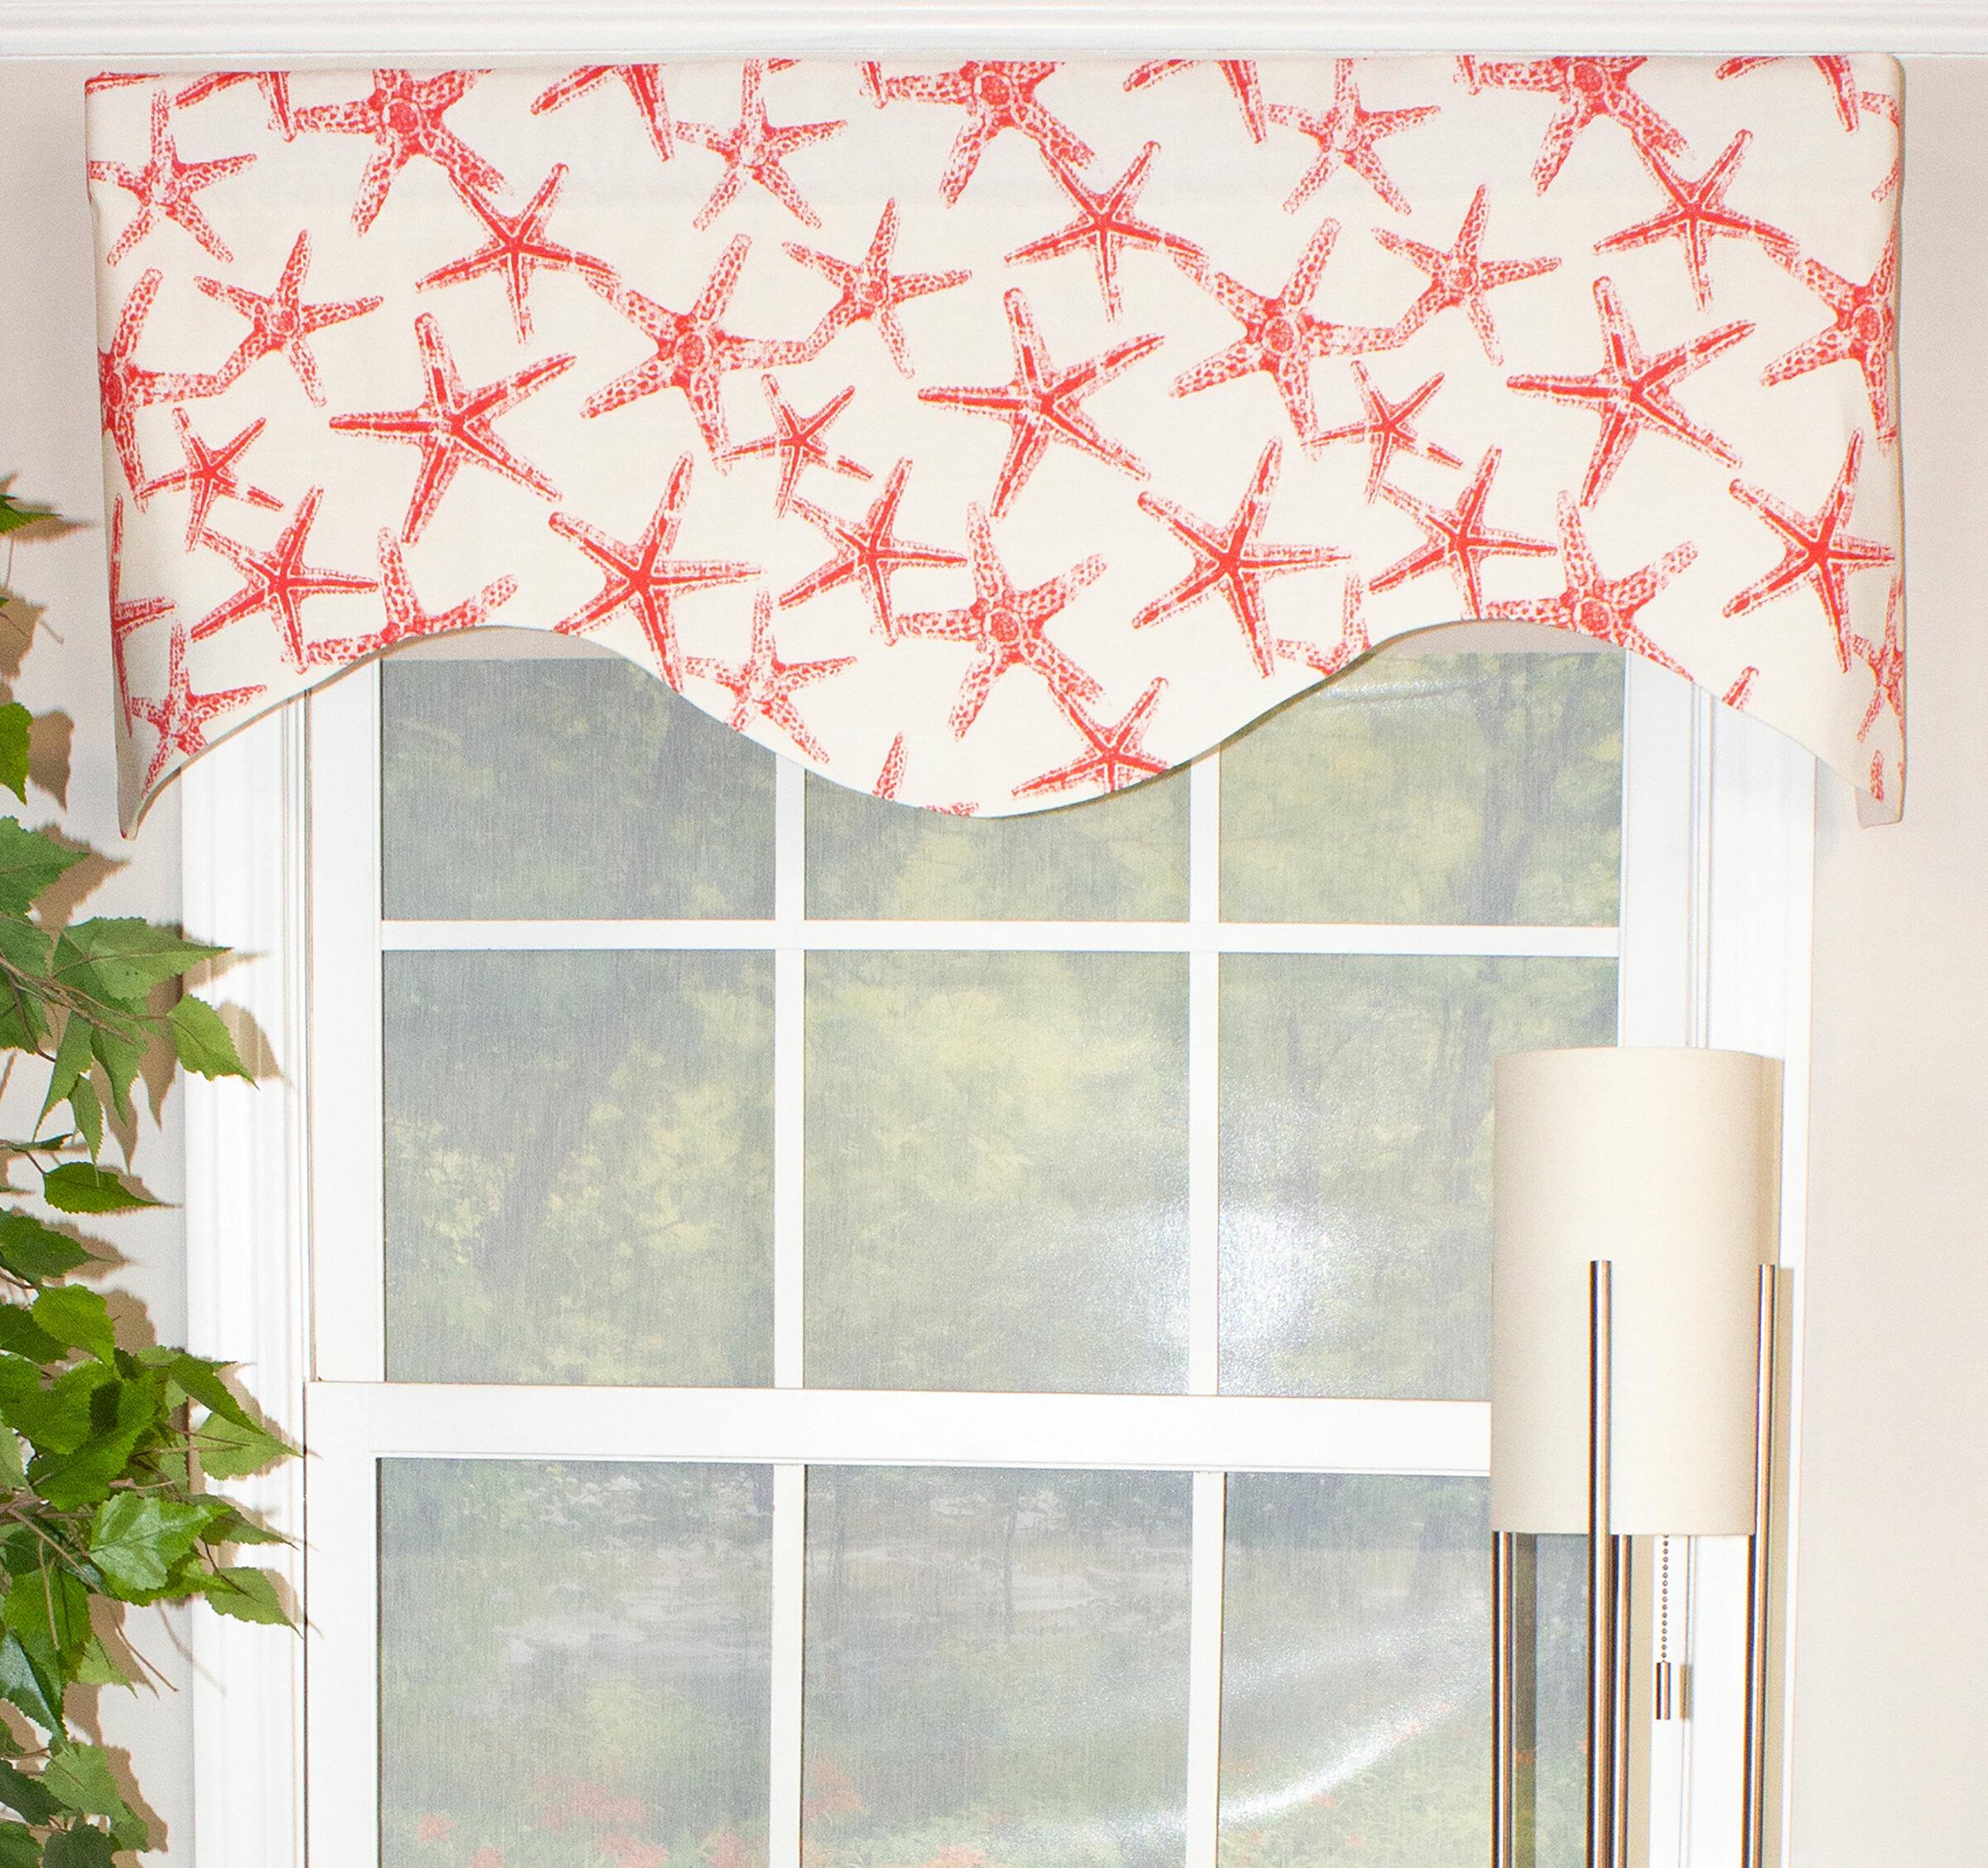 Bay Window Scarf Valances Kitchen Curtains You Ll Love In 2021 Wayfair